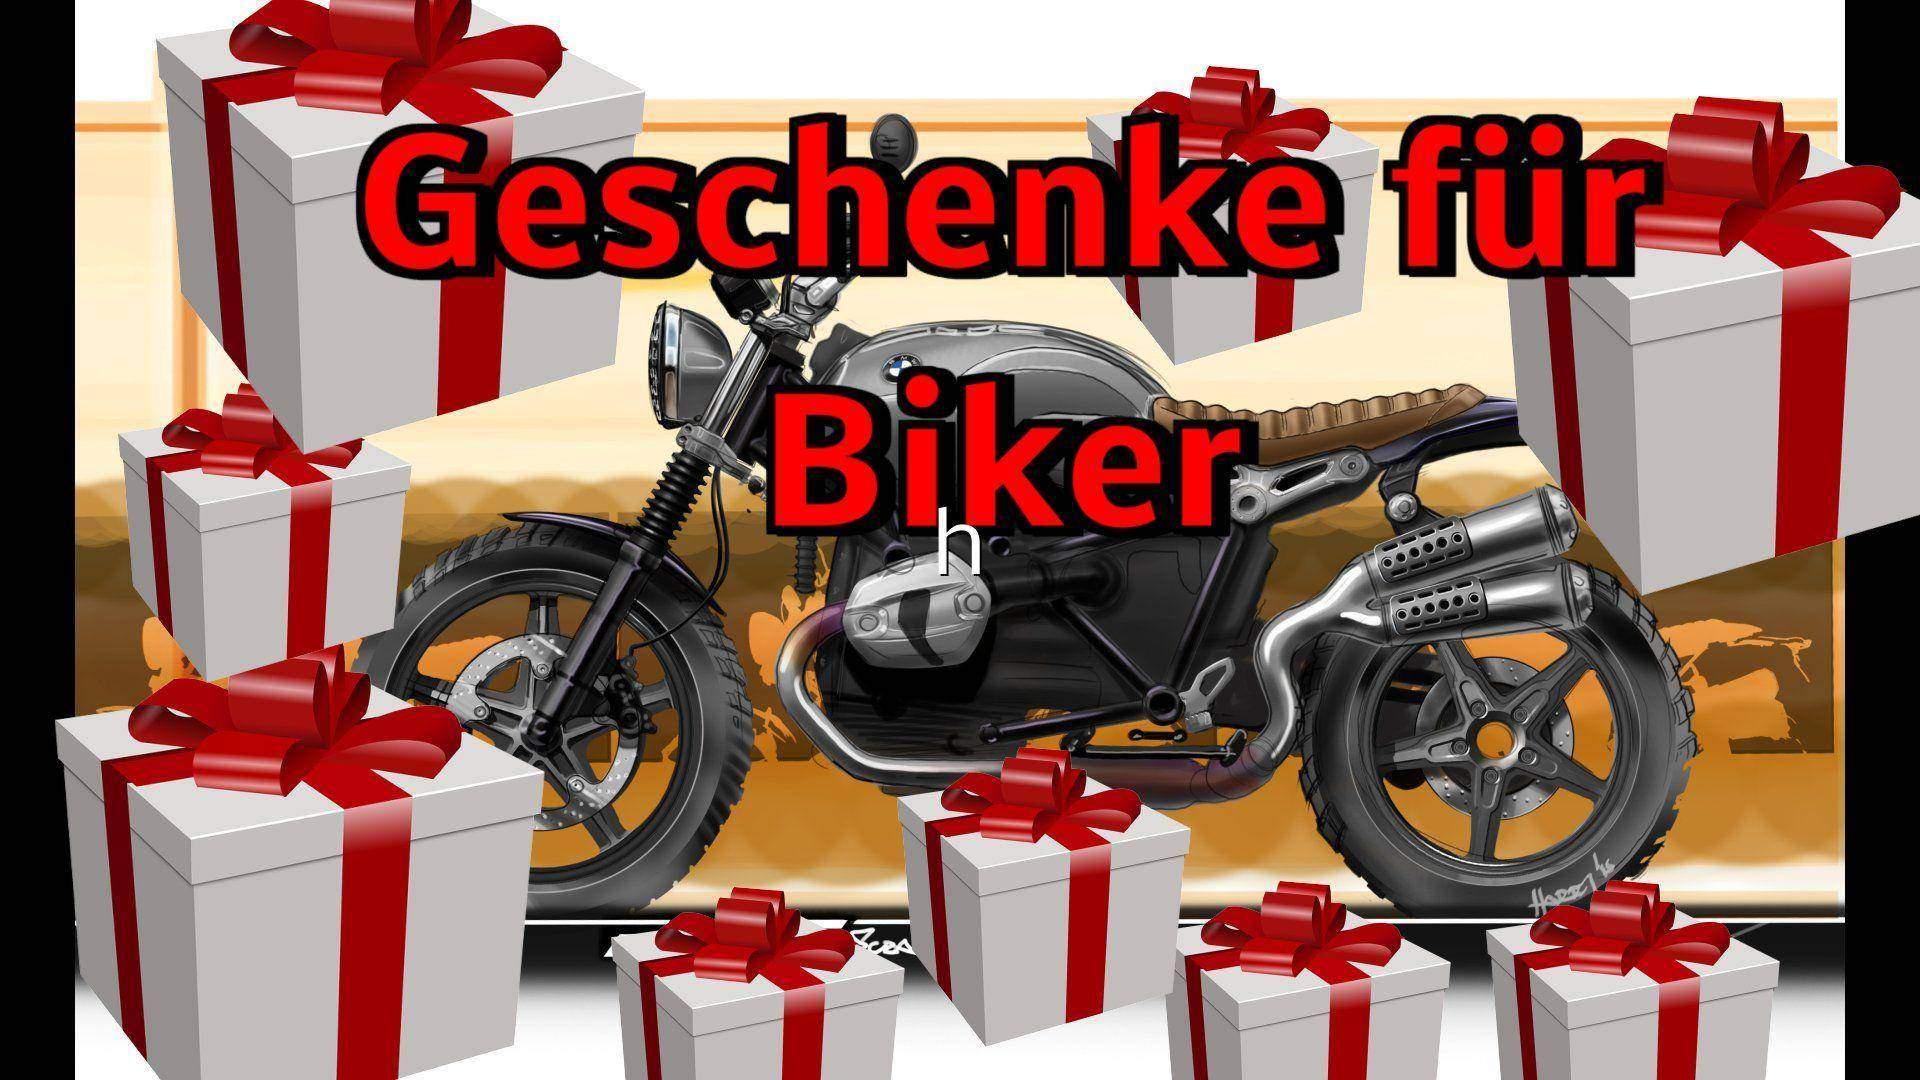 geschenke f r biker motorcycles news motorcycle magazine. Black Bedroom Furniture Sets. Home Design Ideas